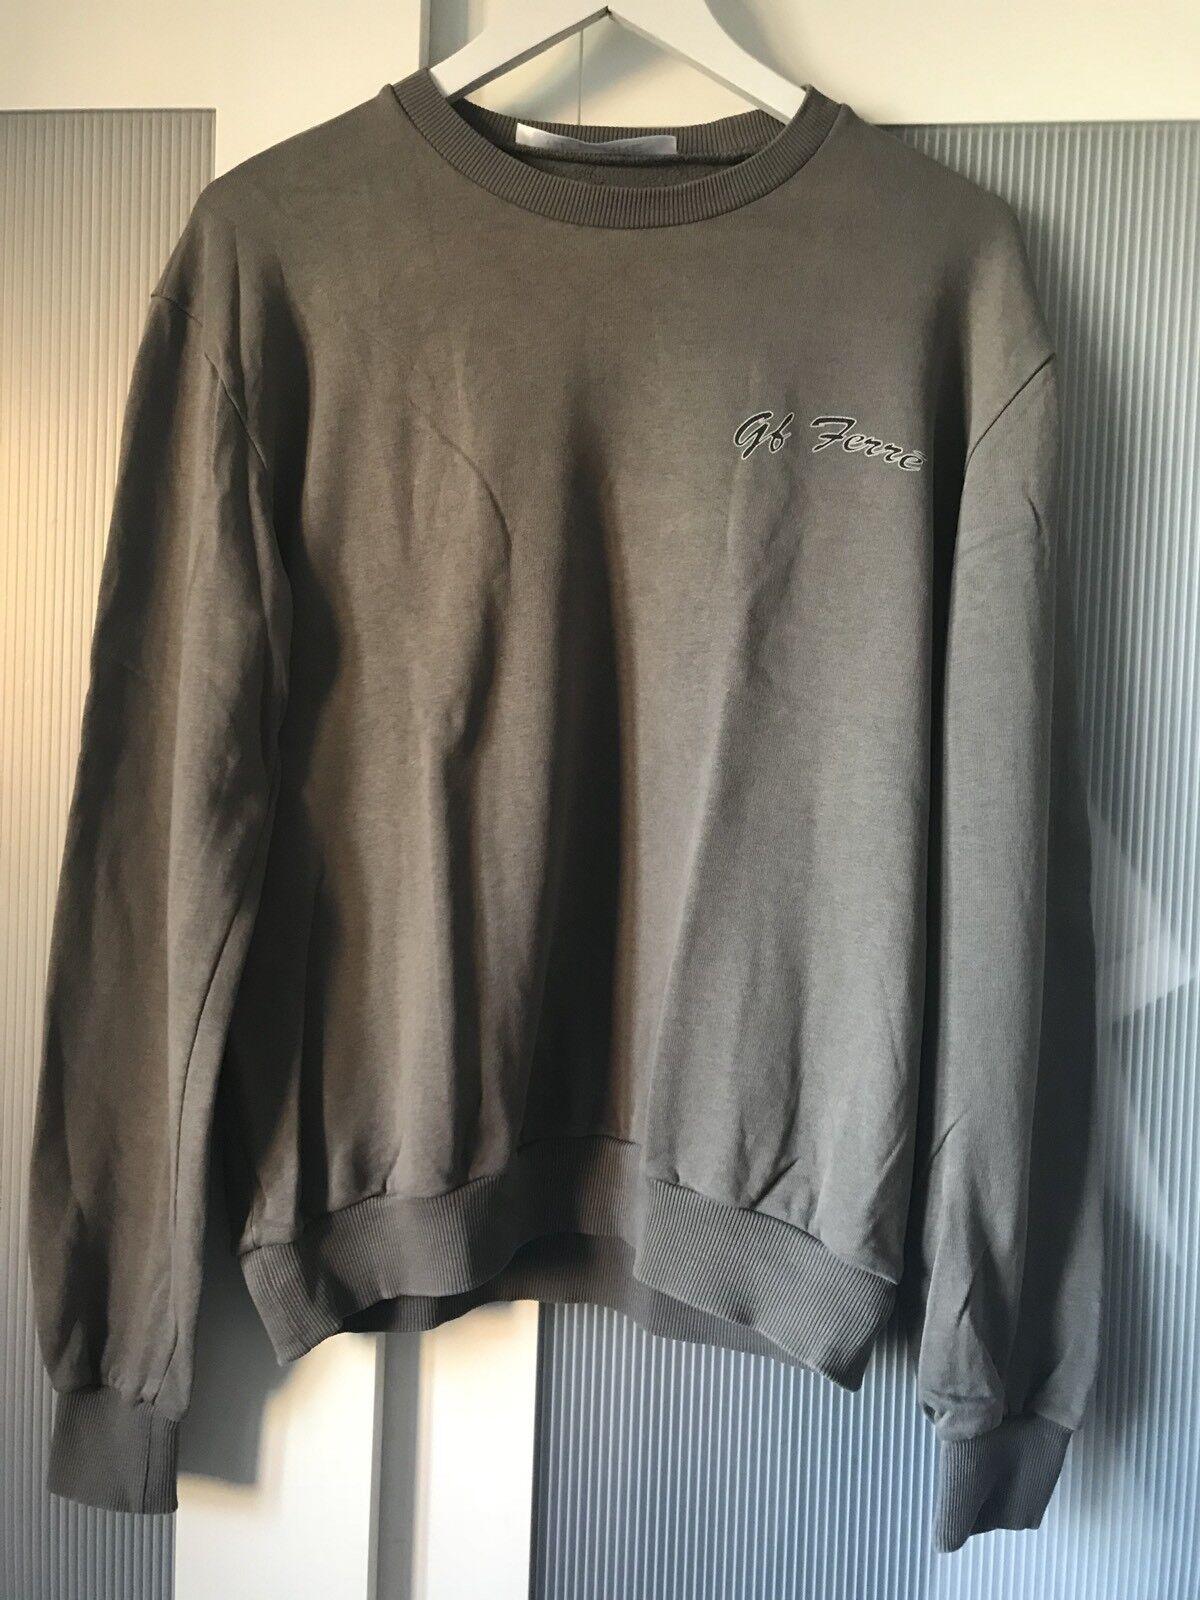 G F Ferre sweater sweatshirt  jumper top Ultra Rare  100% authentic item